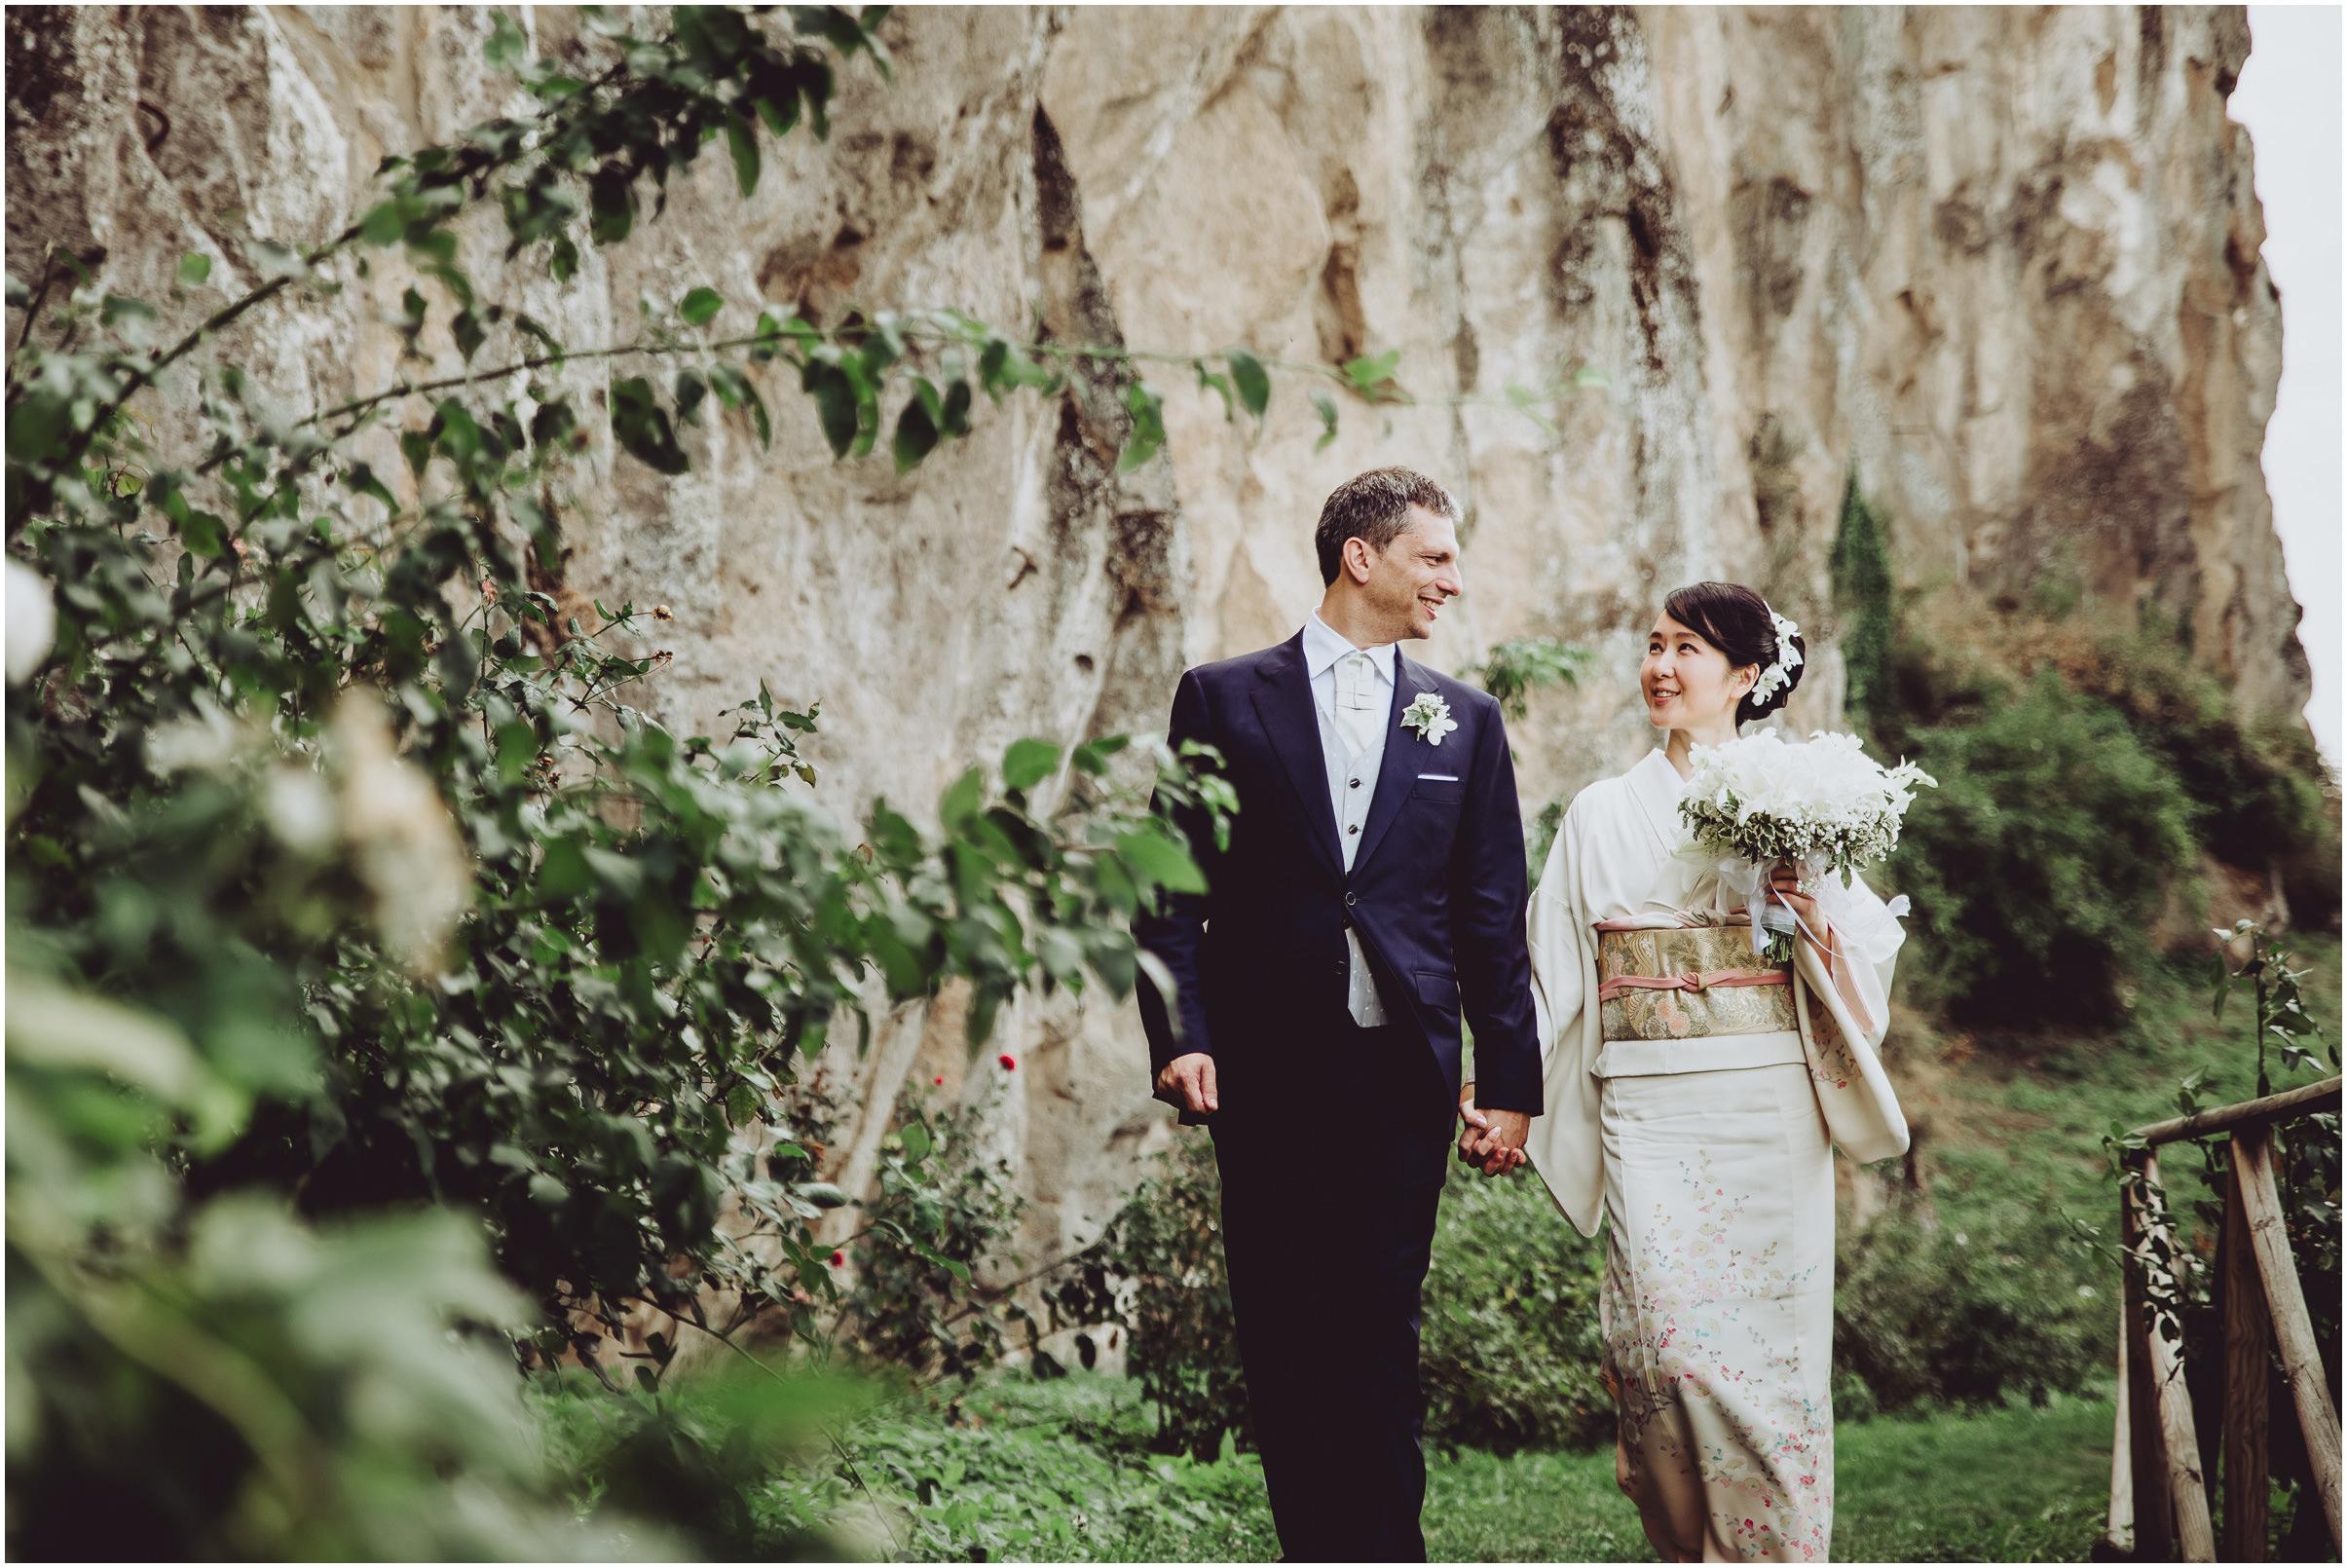 WEDDING-PHOTOGRAPHY-SARA-LORENZONI-FOTOGRAFIA-MATRIMONIO-ORVIETO-JUKA-ANTONELLO41